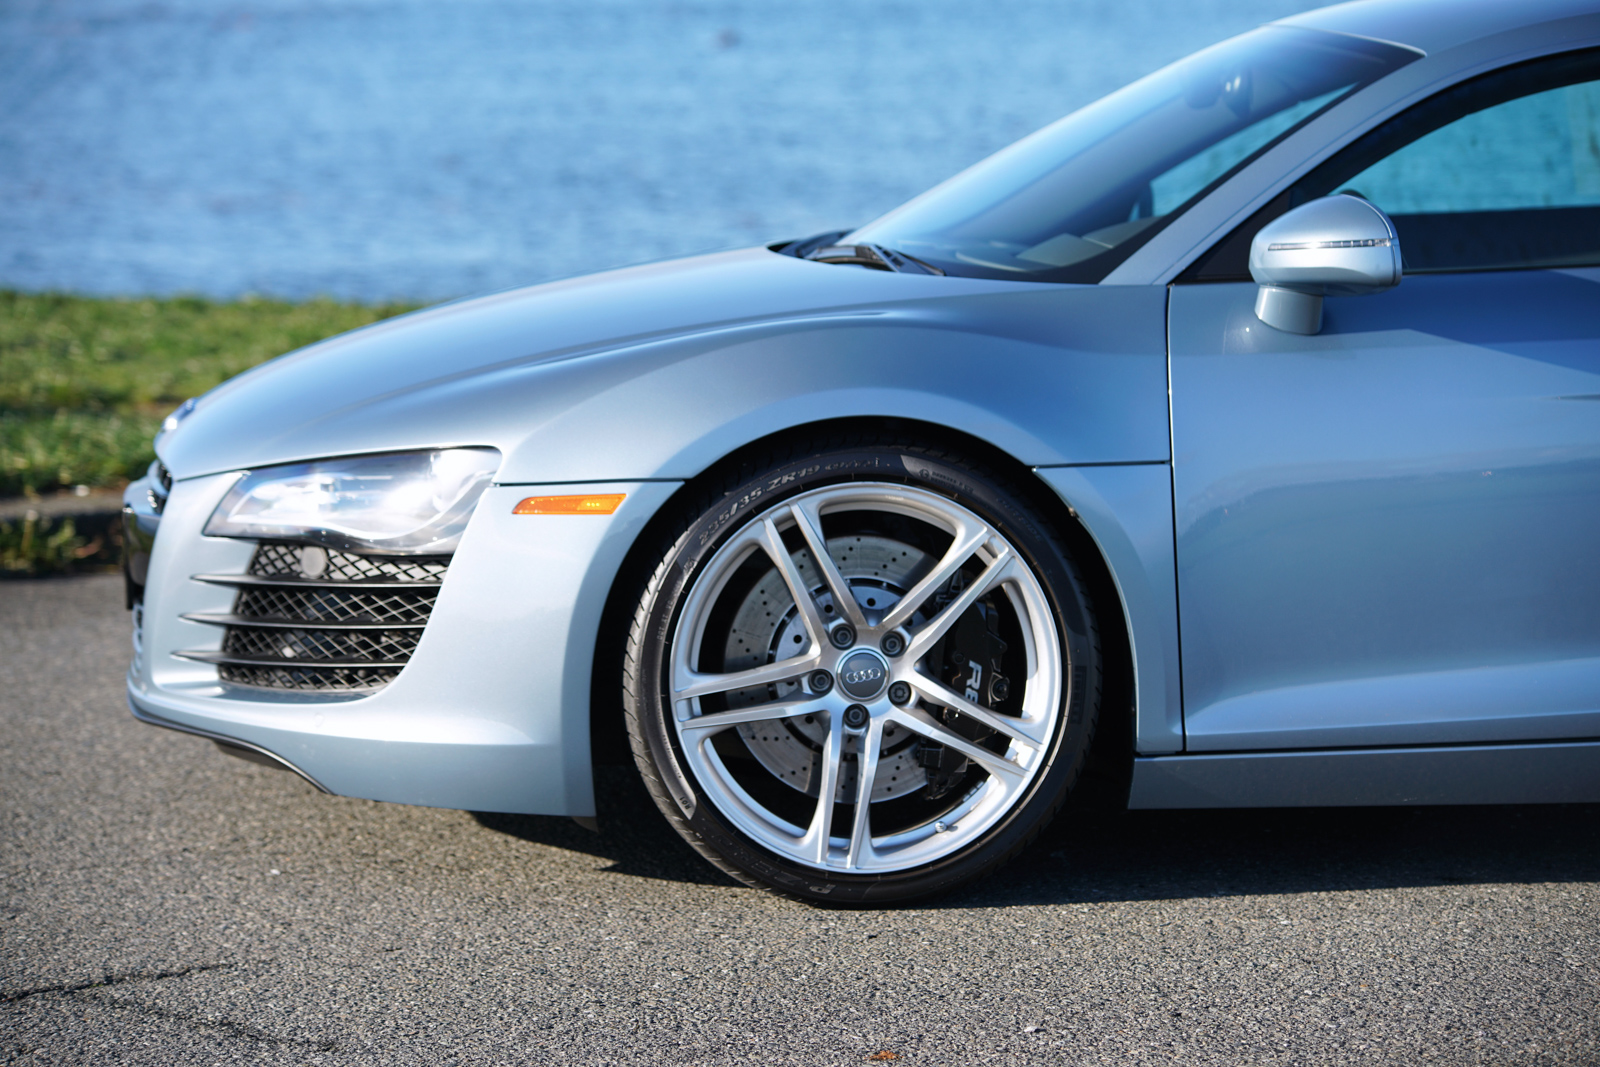 2008 Audi R8 Coupe 6-Speed - Silver Arrow Cars Ltd.